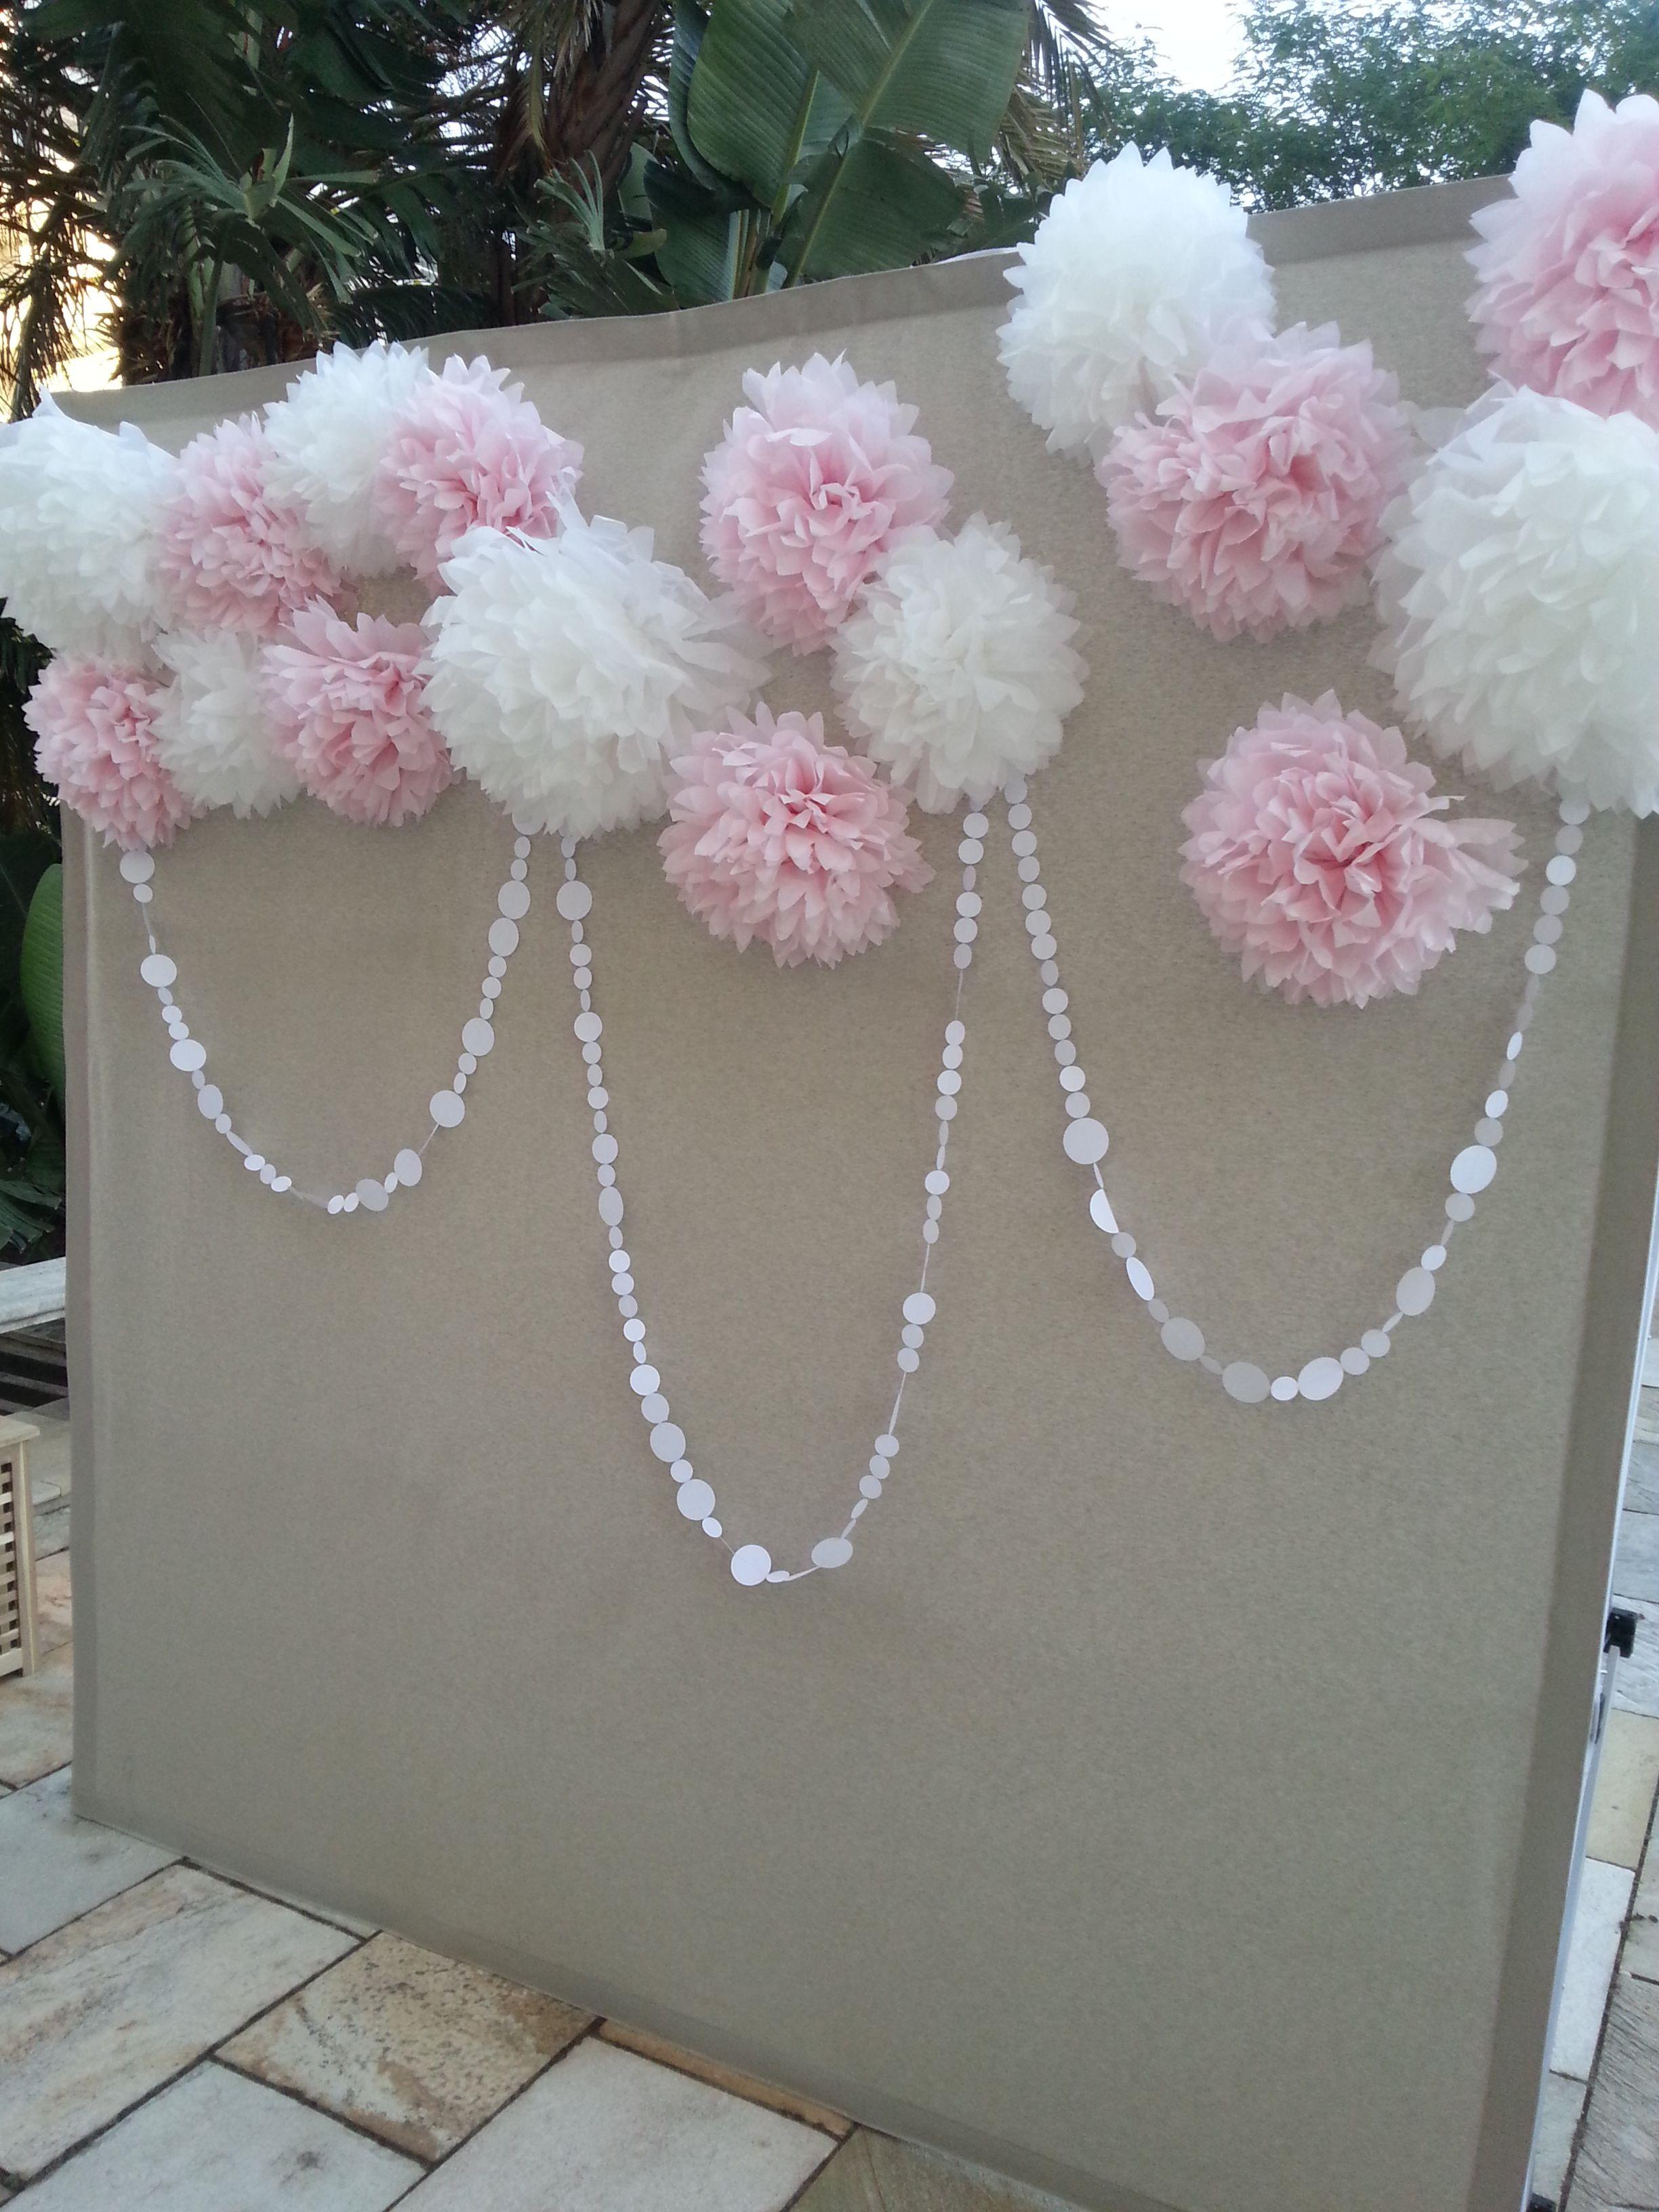 Photocall pompones rosa murales flores papel pinterest pompones boda y comuni n - Photocall boda casero ...